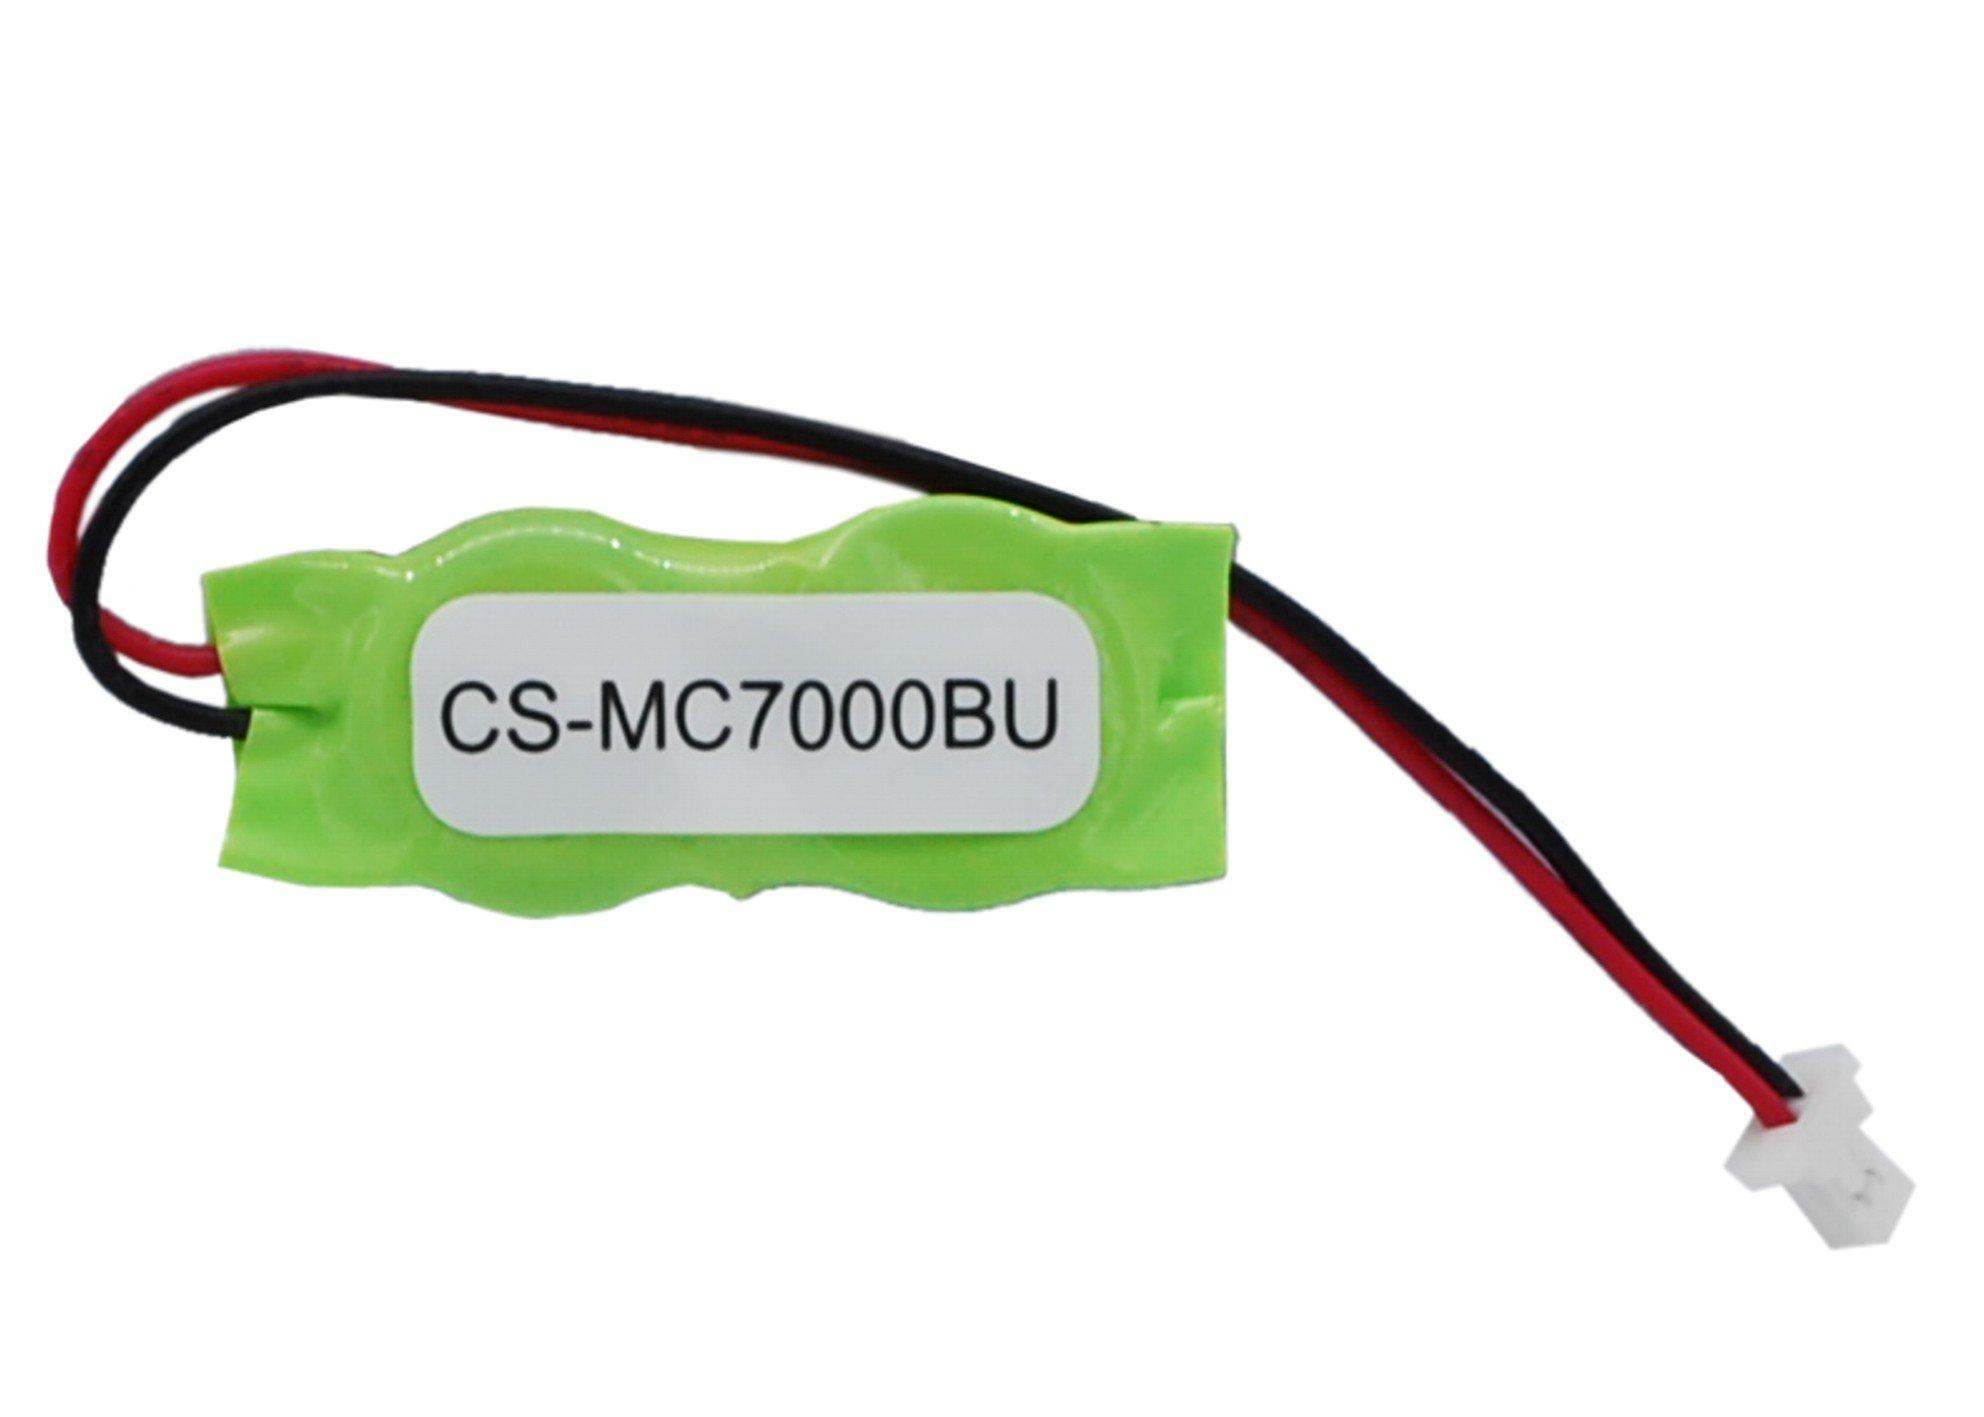 Replacement Battery for Symbol MC70, MC7004, MC7090, MC7094, MC75, MC7506-PKCSKQWA9WR, MC7506-PKCSKQWA9WR-KIT, MC7506-PKCSKRWA9WR